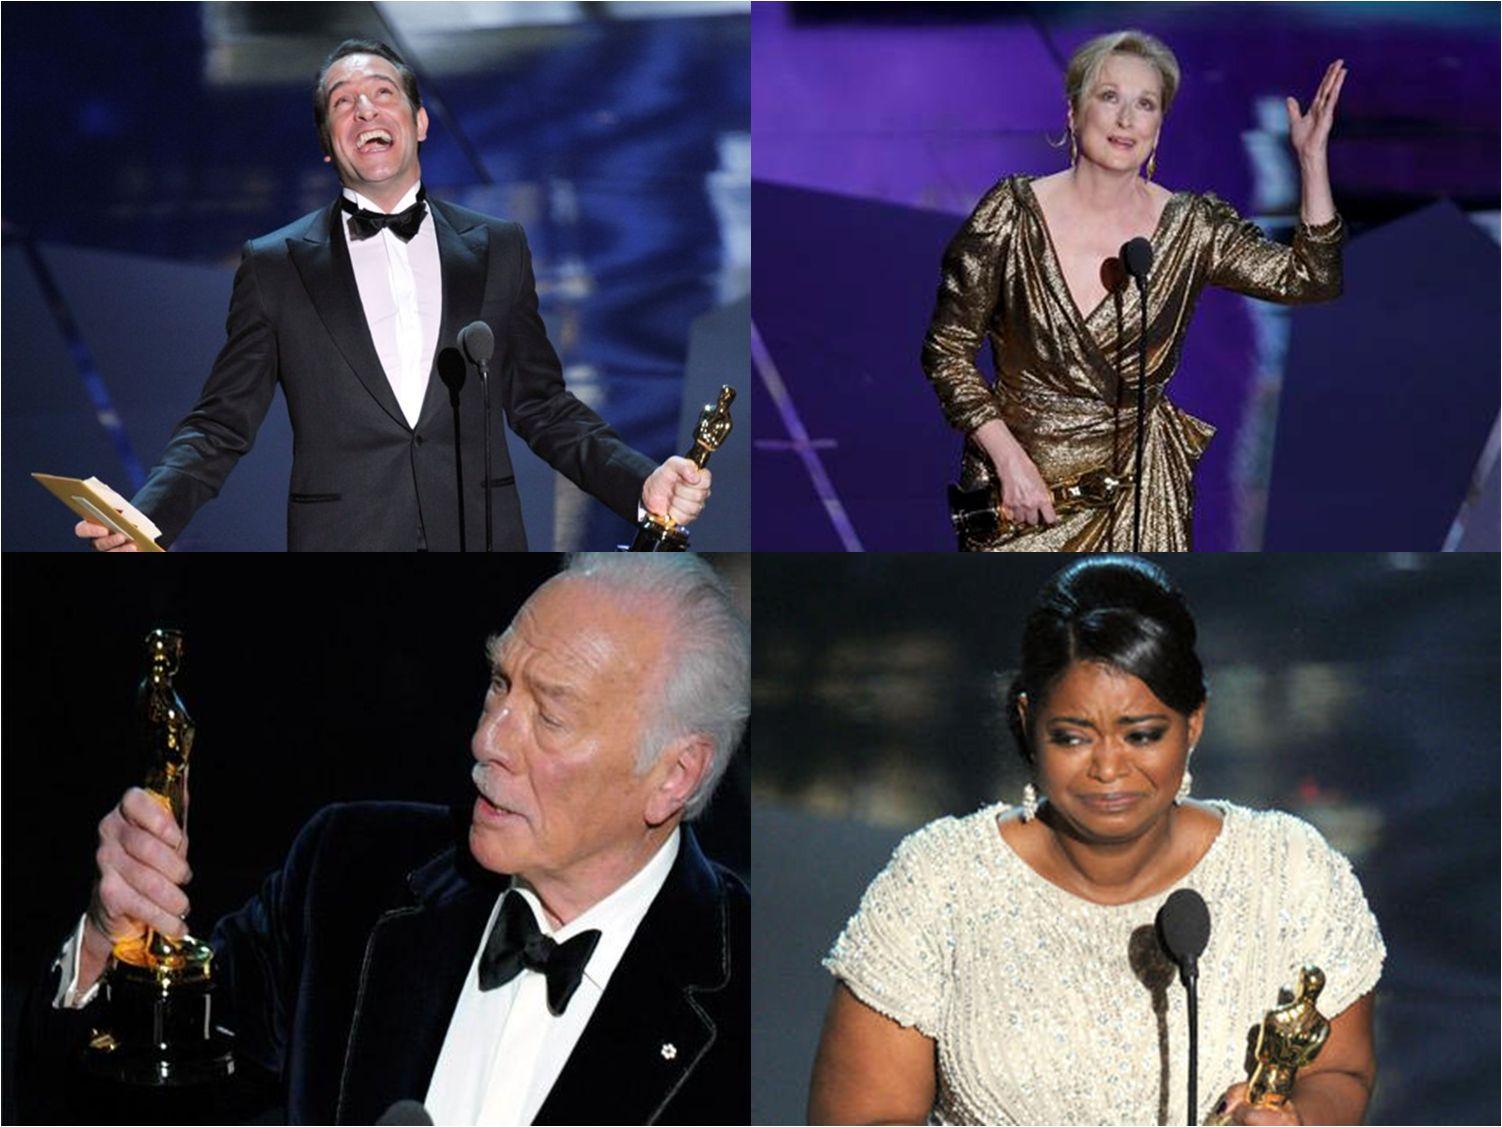 http://1.bp.blogspot.com/-0zunVhXRHf4/T0seThJBZjI/AAAAAAAAA8k/ot_jpAOgJ8s/s1600/actors+winners+oscar.jpg